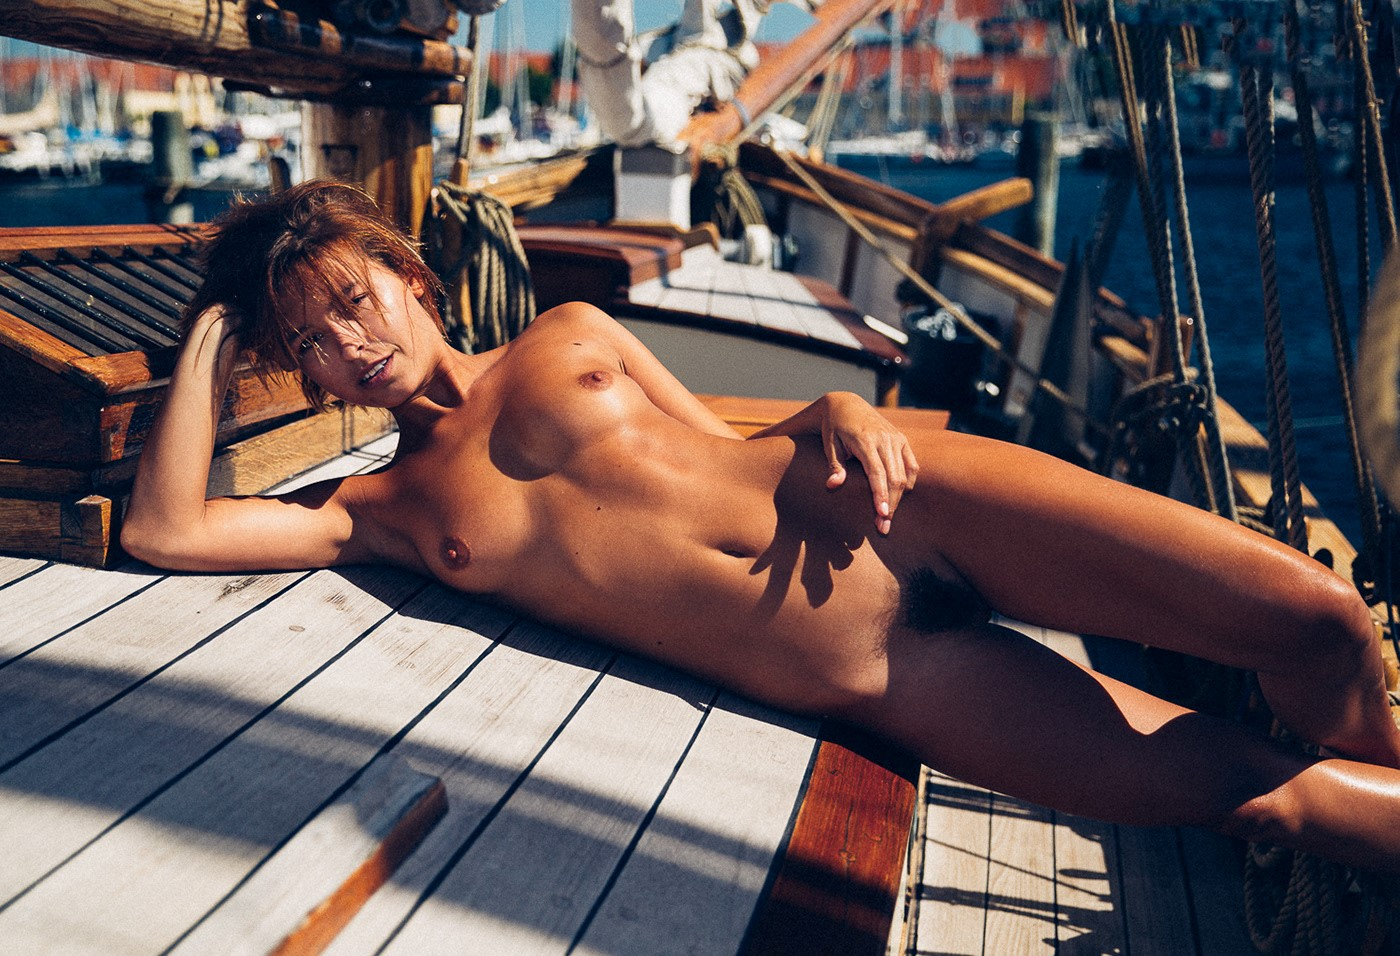 Marisa coughlan nude in new suit